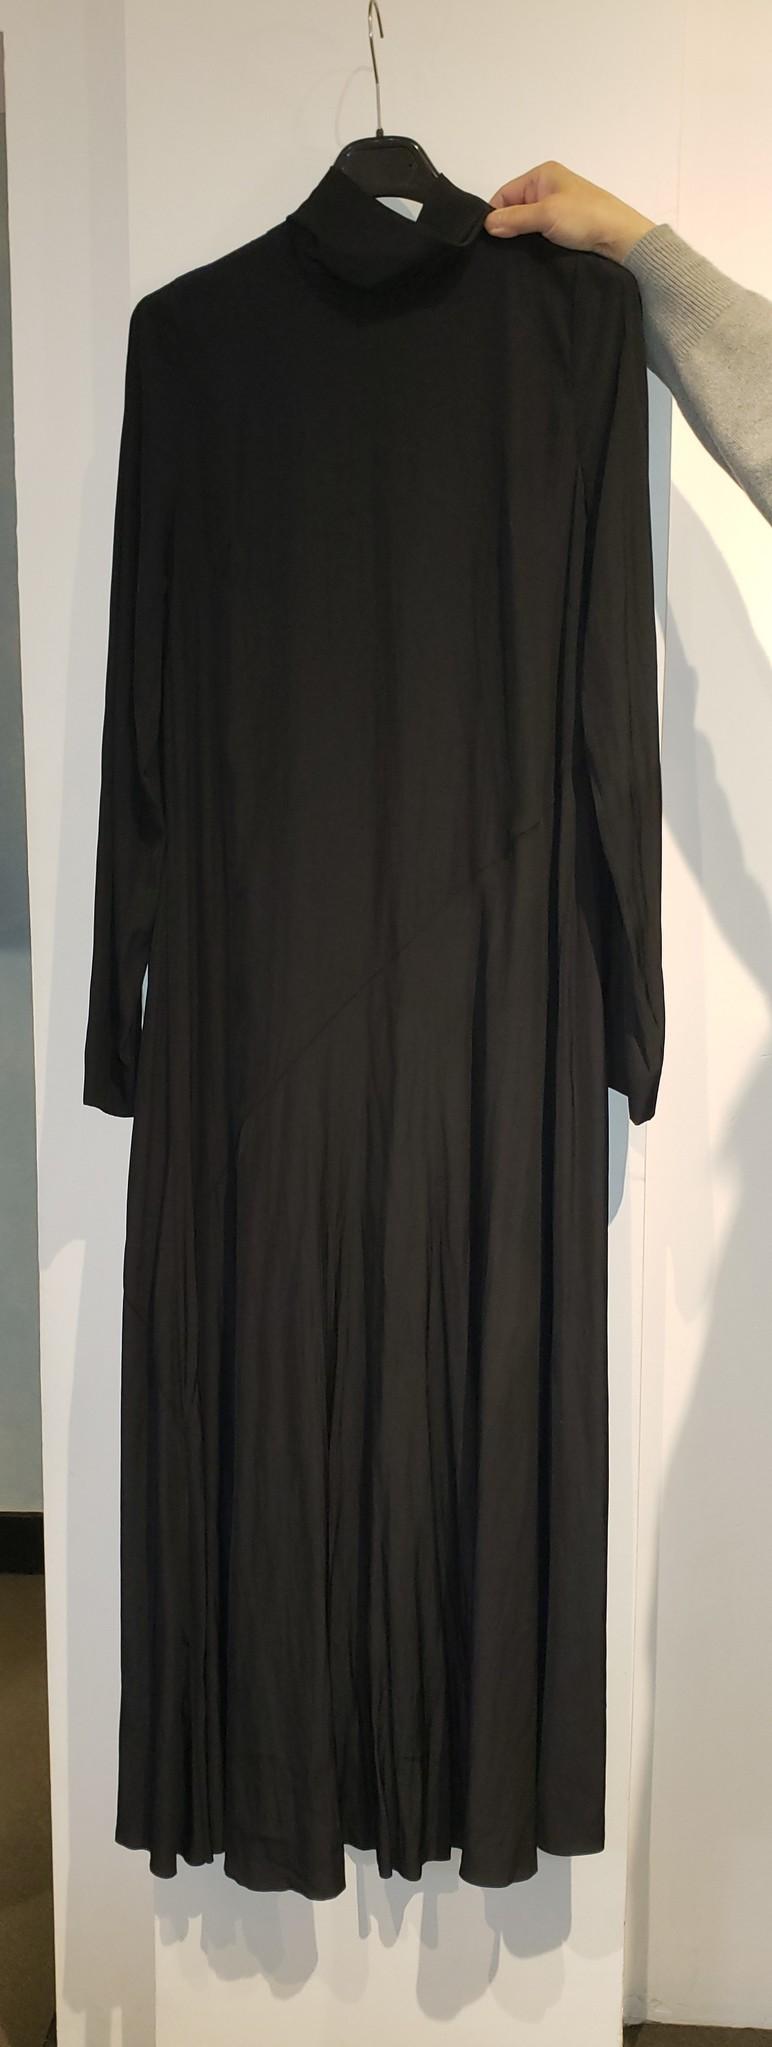 Dress Full length - Blk - Sz. 38-1